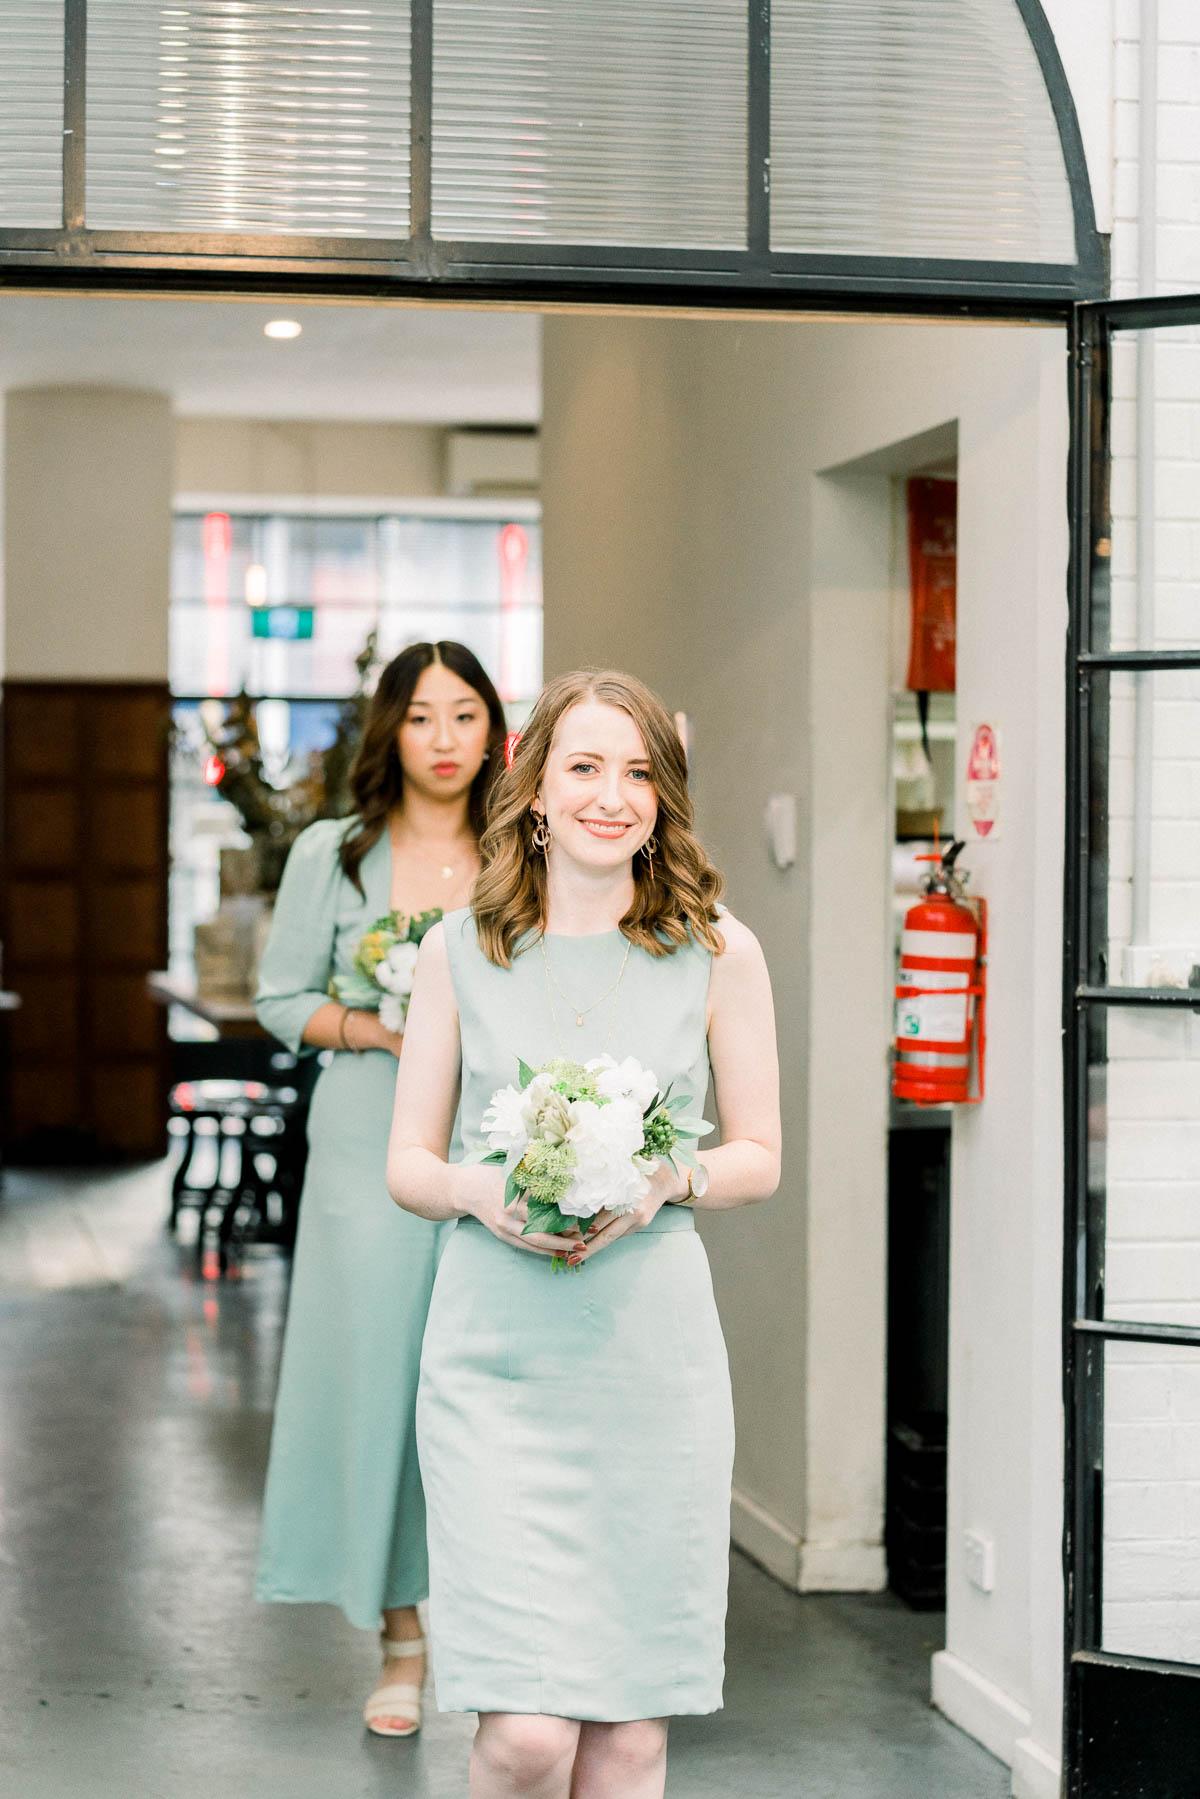 little-henri-cafe-wedding-thornbury-heart+soul-weddings-jane-aaron-05596.jpg